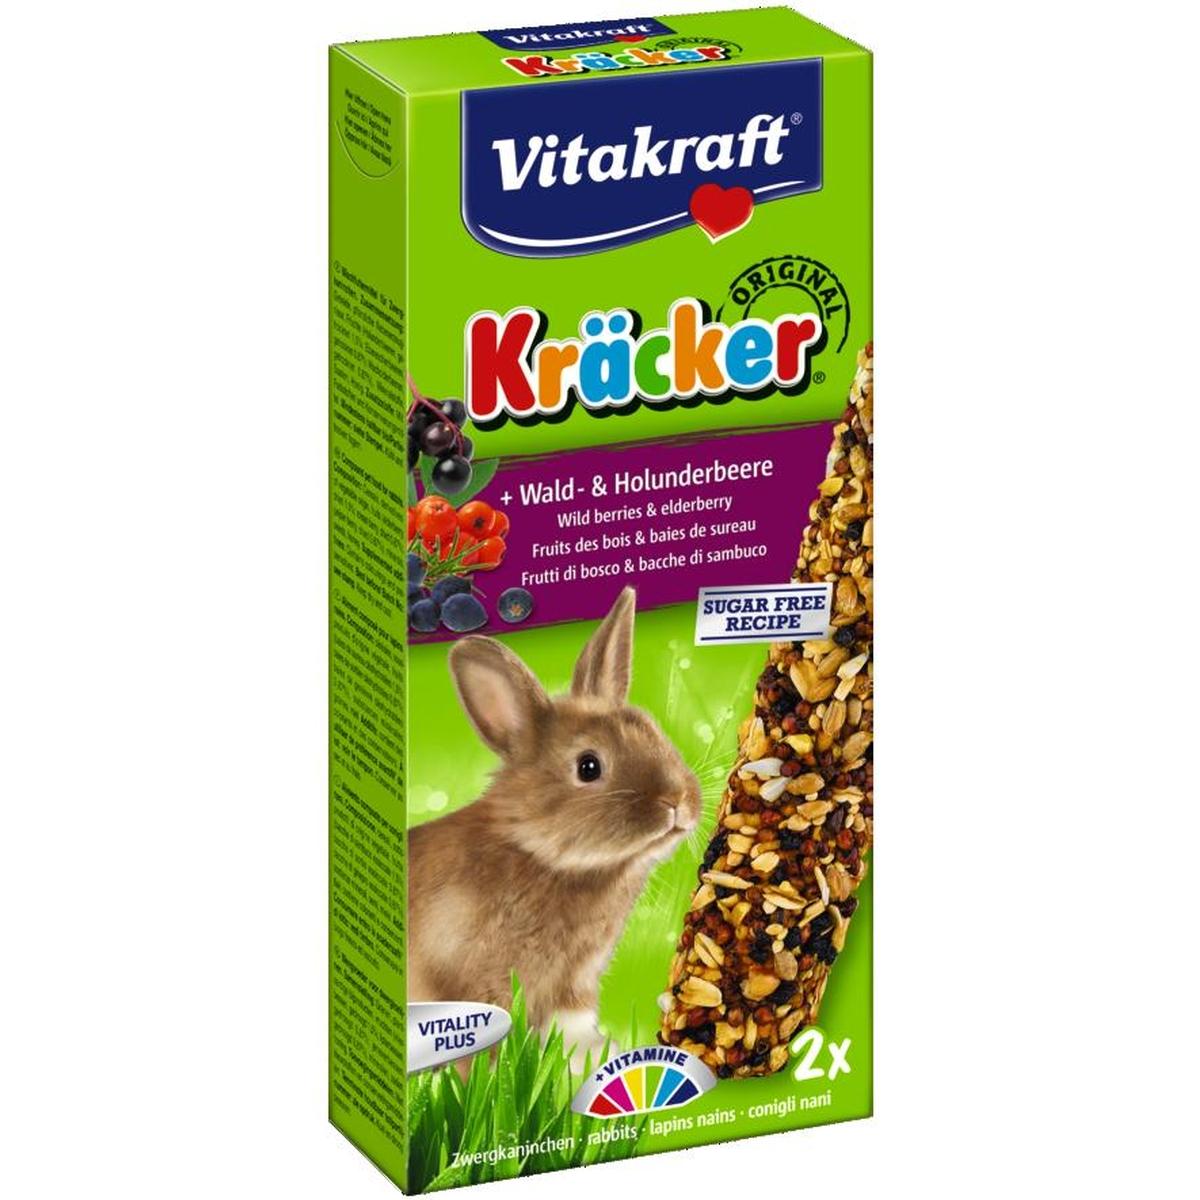 Vitakraft - konijnkracker 2 in 1 meerkleurig 160 gr